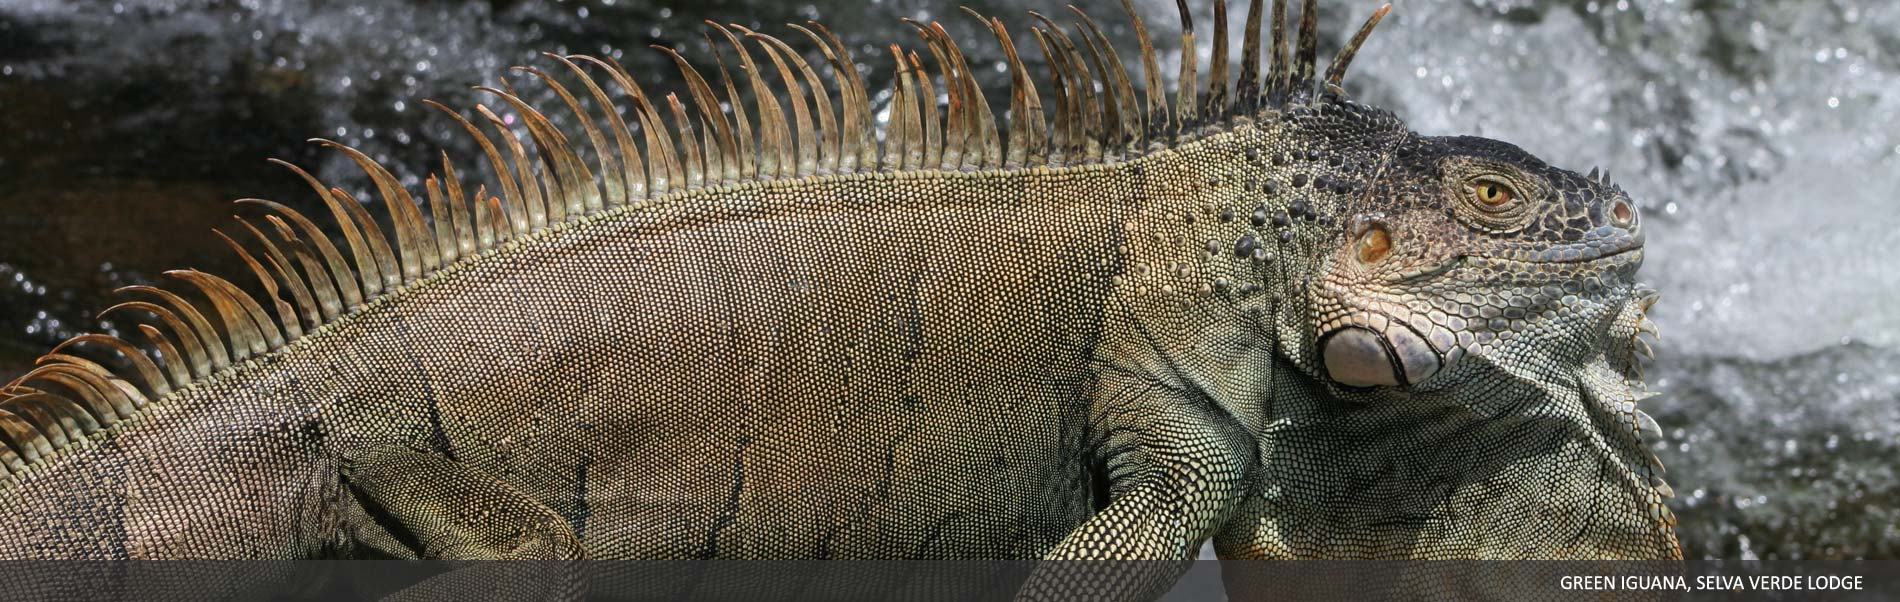 Amphibians-Reptiles-04.jpg